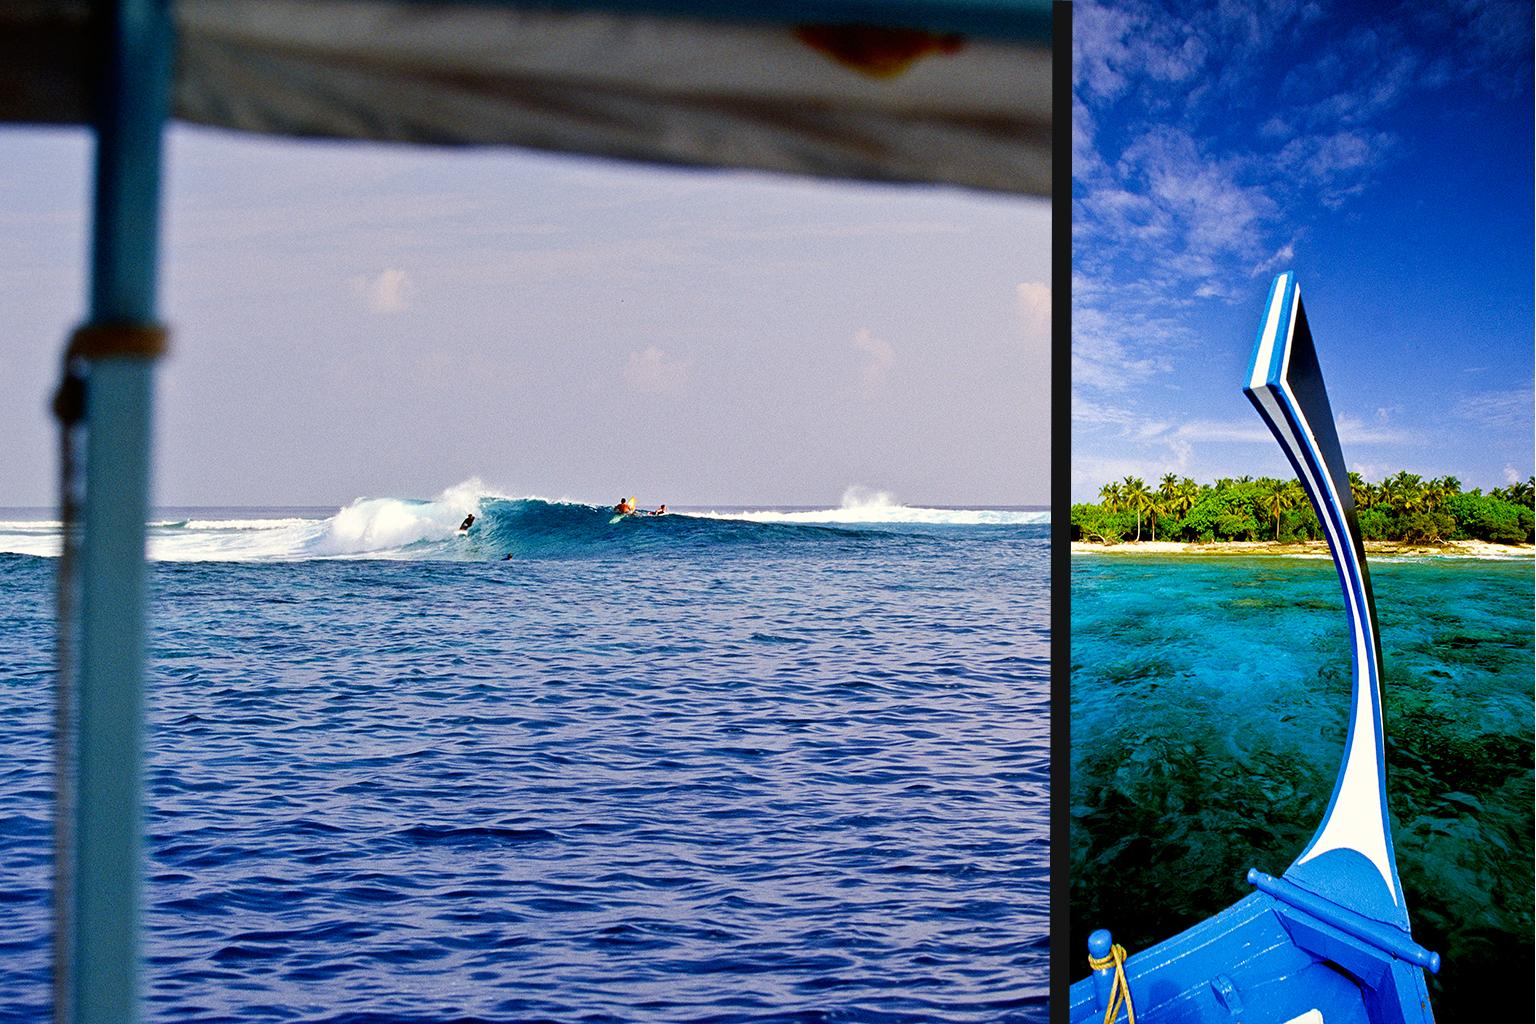 Maldives. Photo: John Seaton Callahan